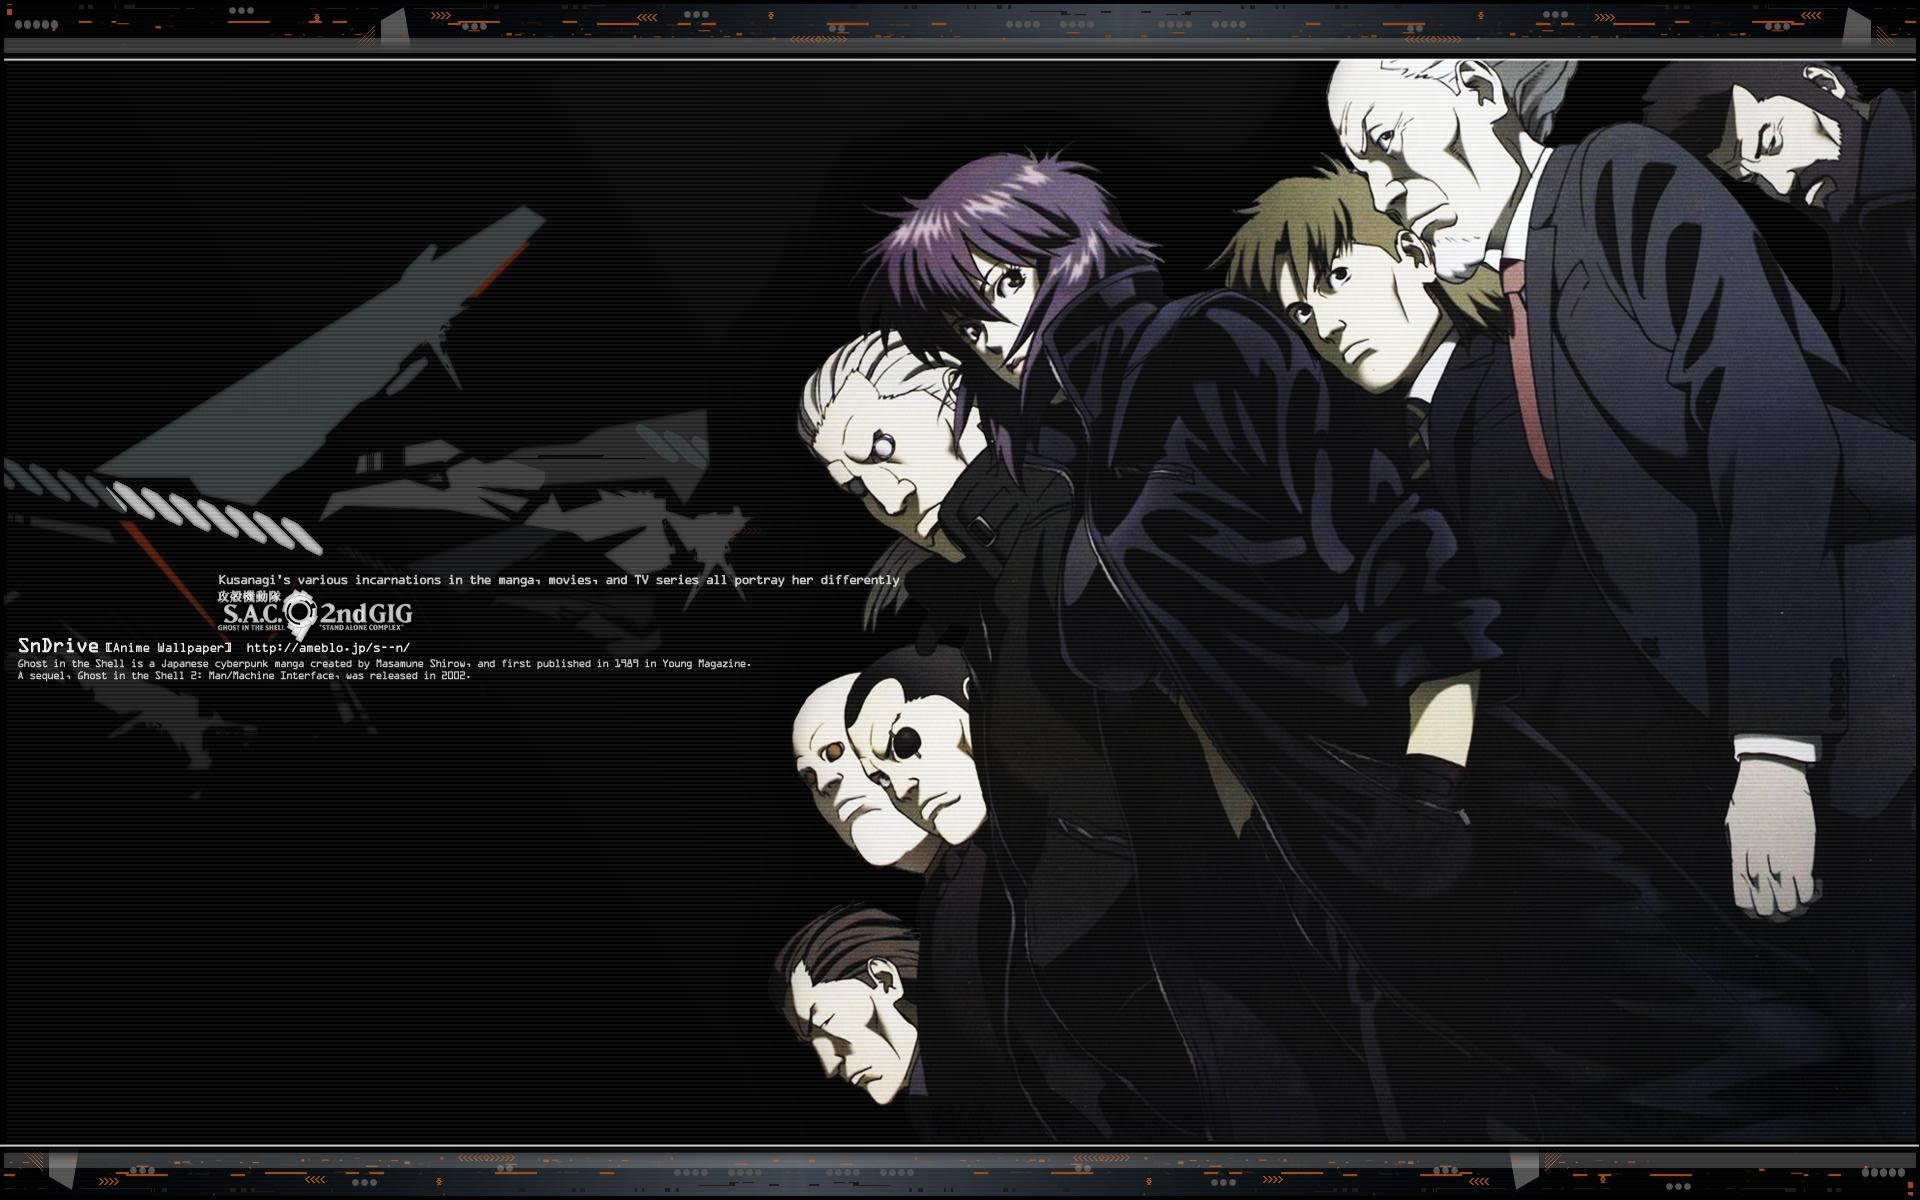 aramaki_daisuke batou black boma ghost_in_the_shell ghost_in_the_shell:_stand_alone_complex ishikawa kusanagi_motoko pazu saito togusa